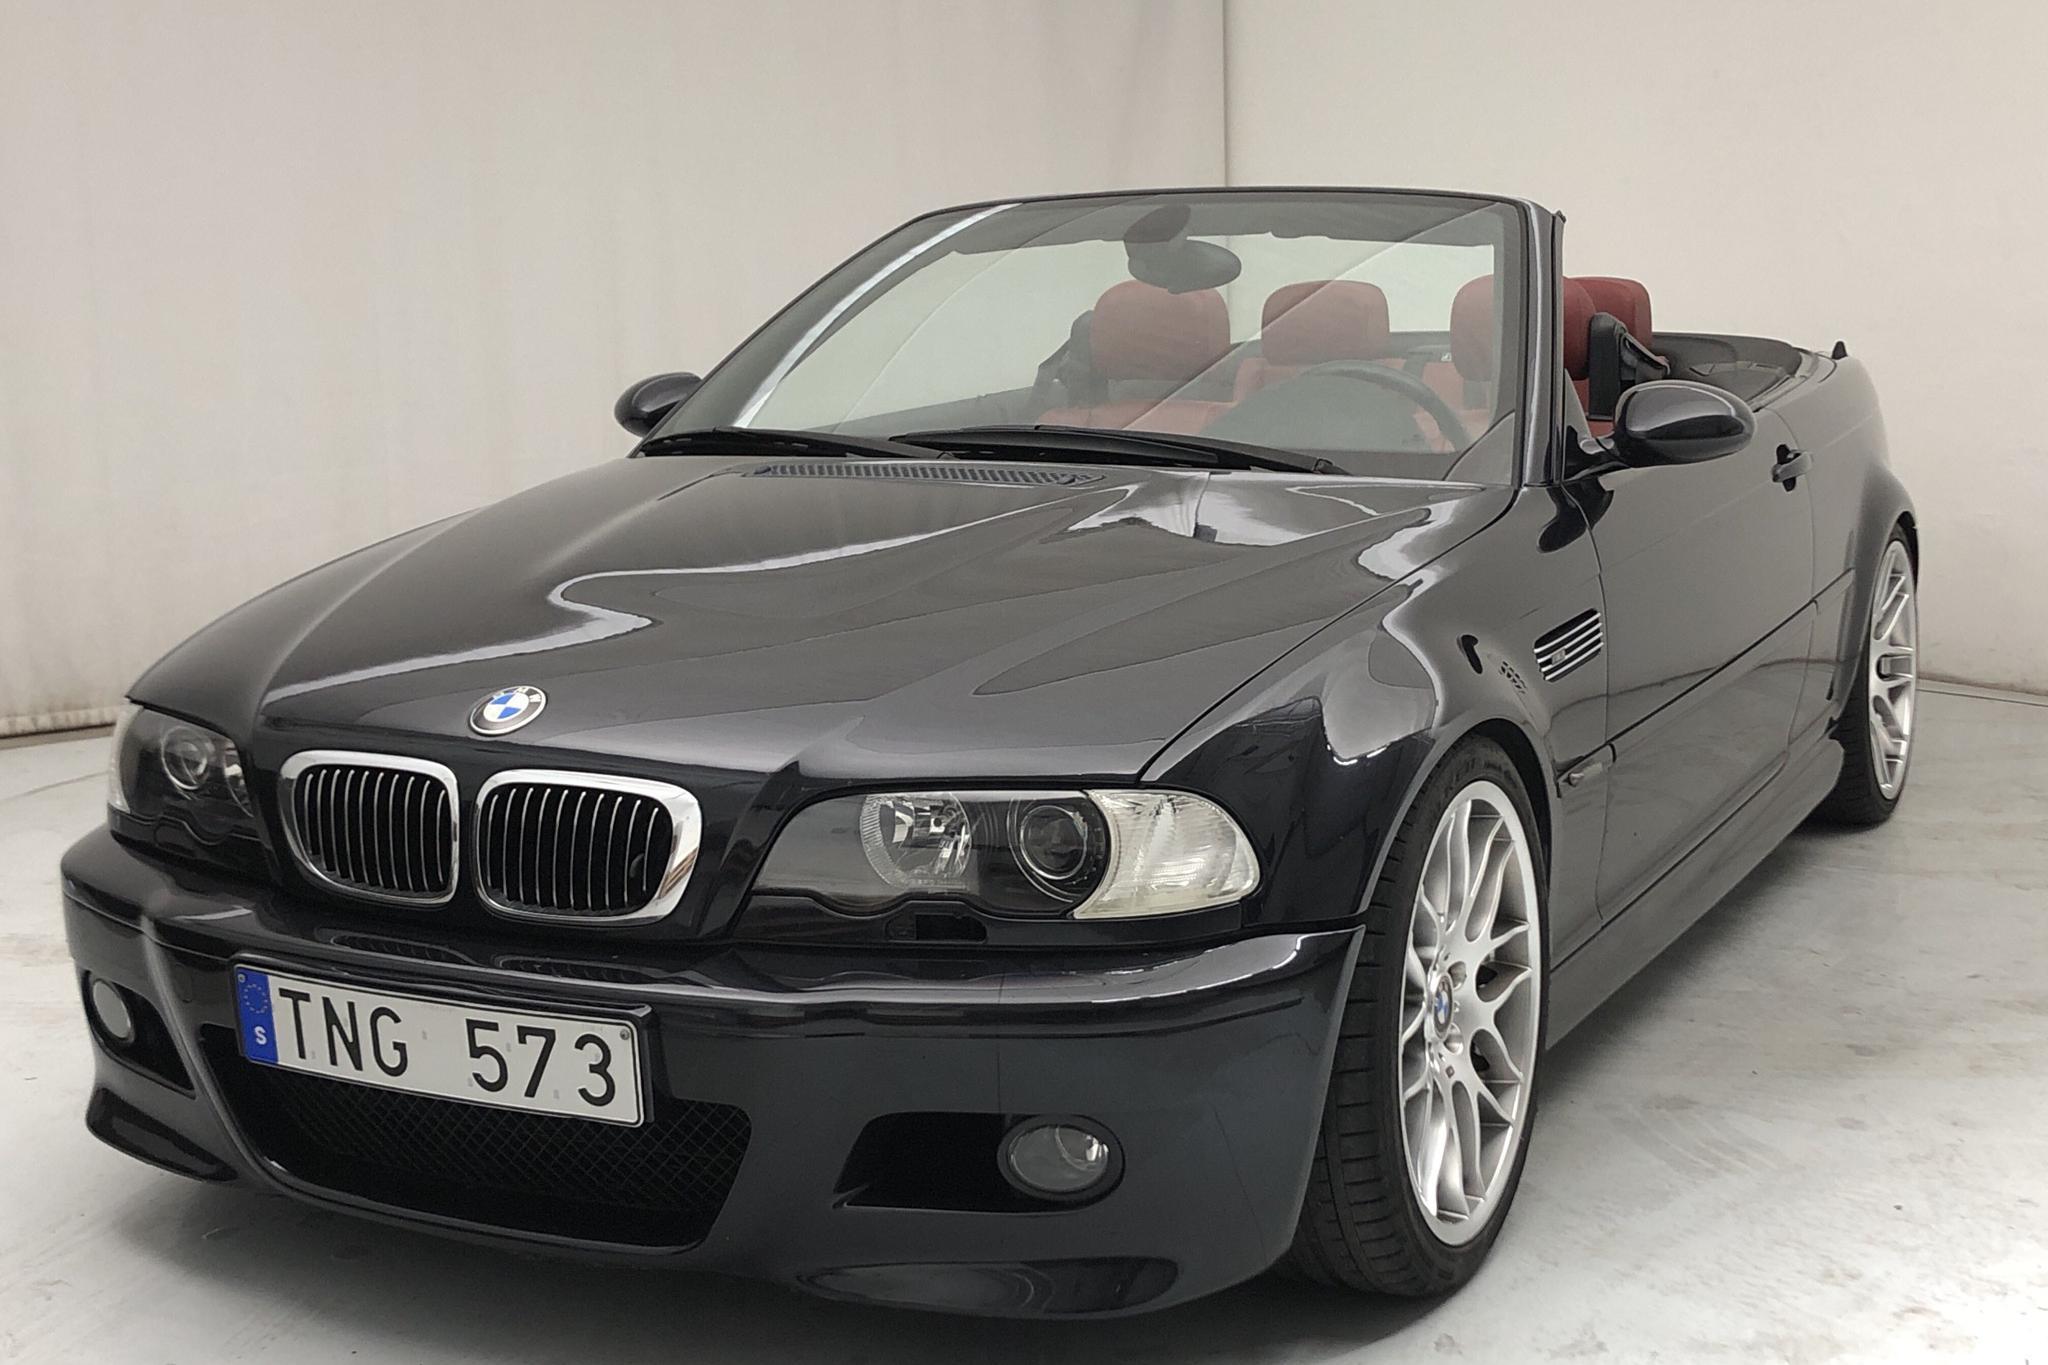 BMW M3 Cabriolet, E46 (343hk) - 131 280 km - Automatic - black - 2002